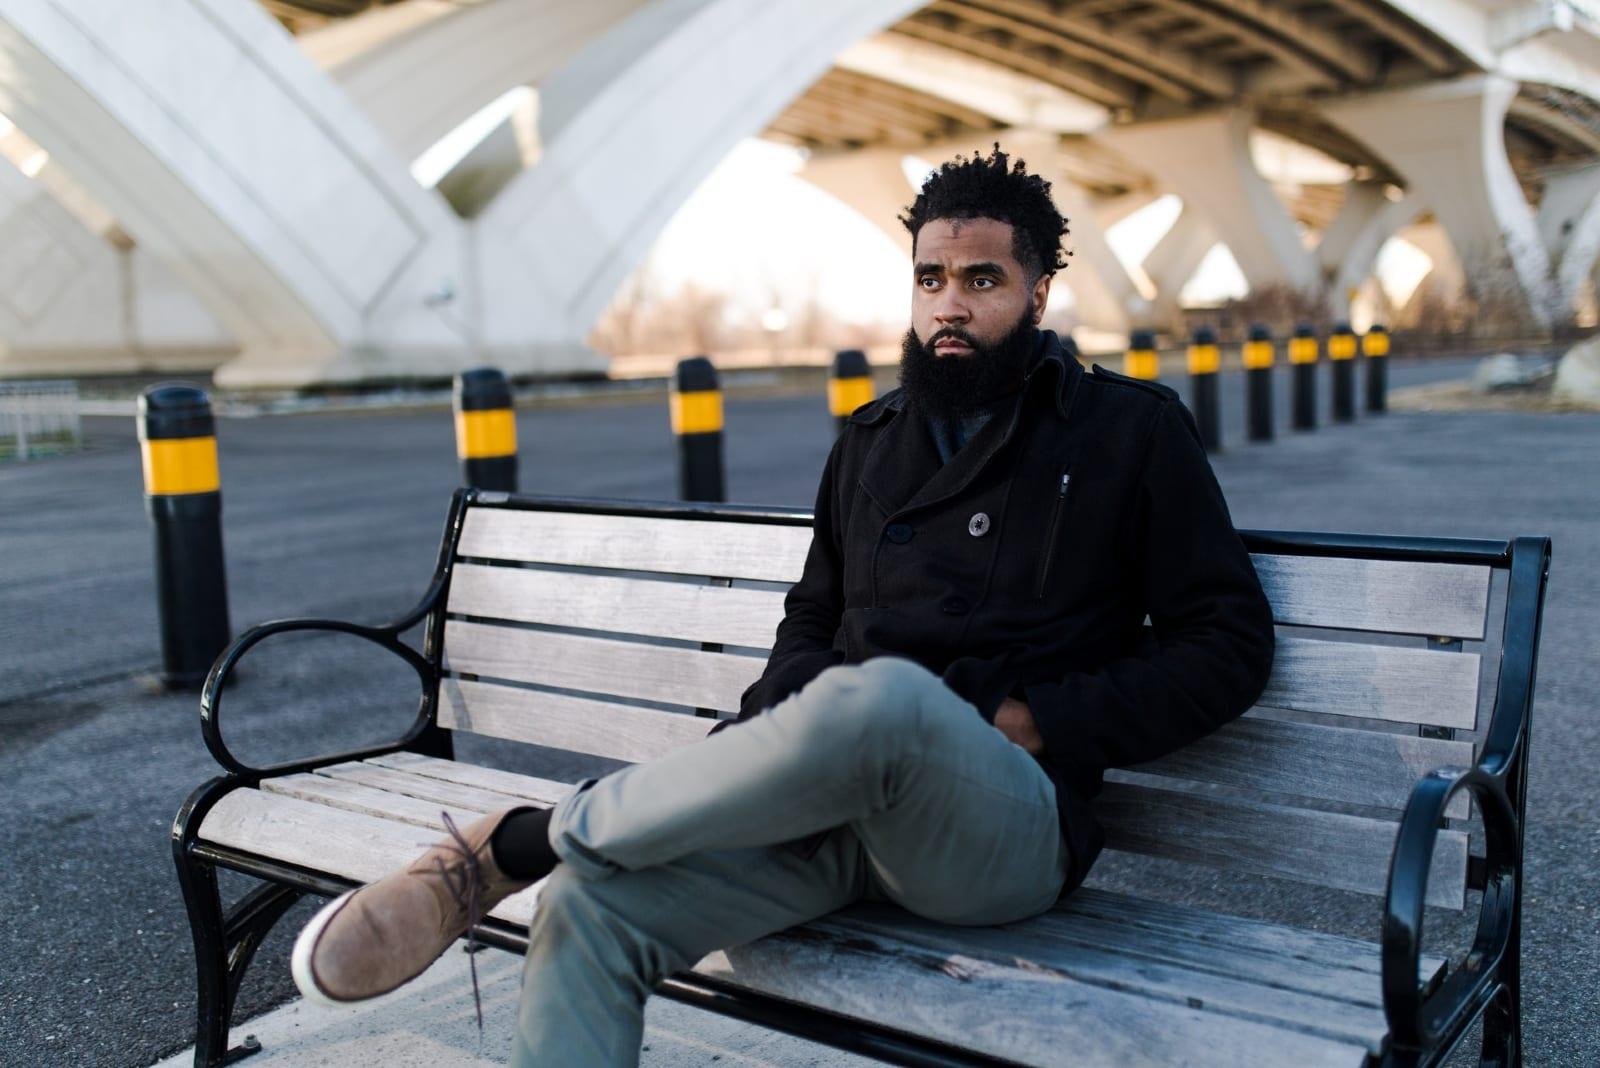 pensive man in black jacket sitting on bench